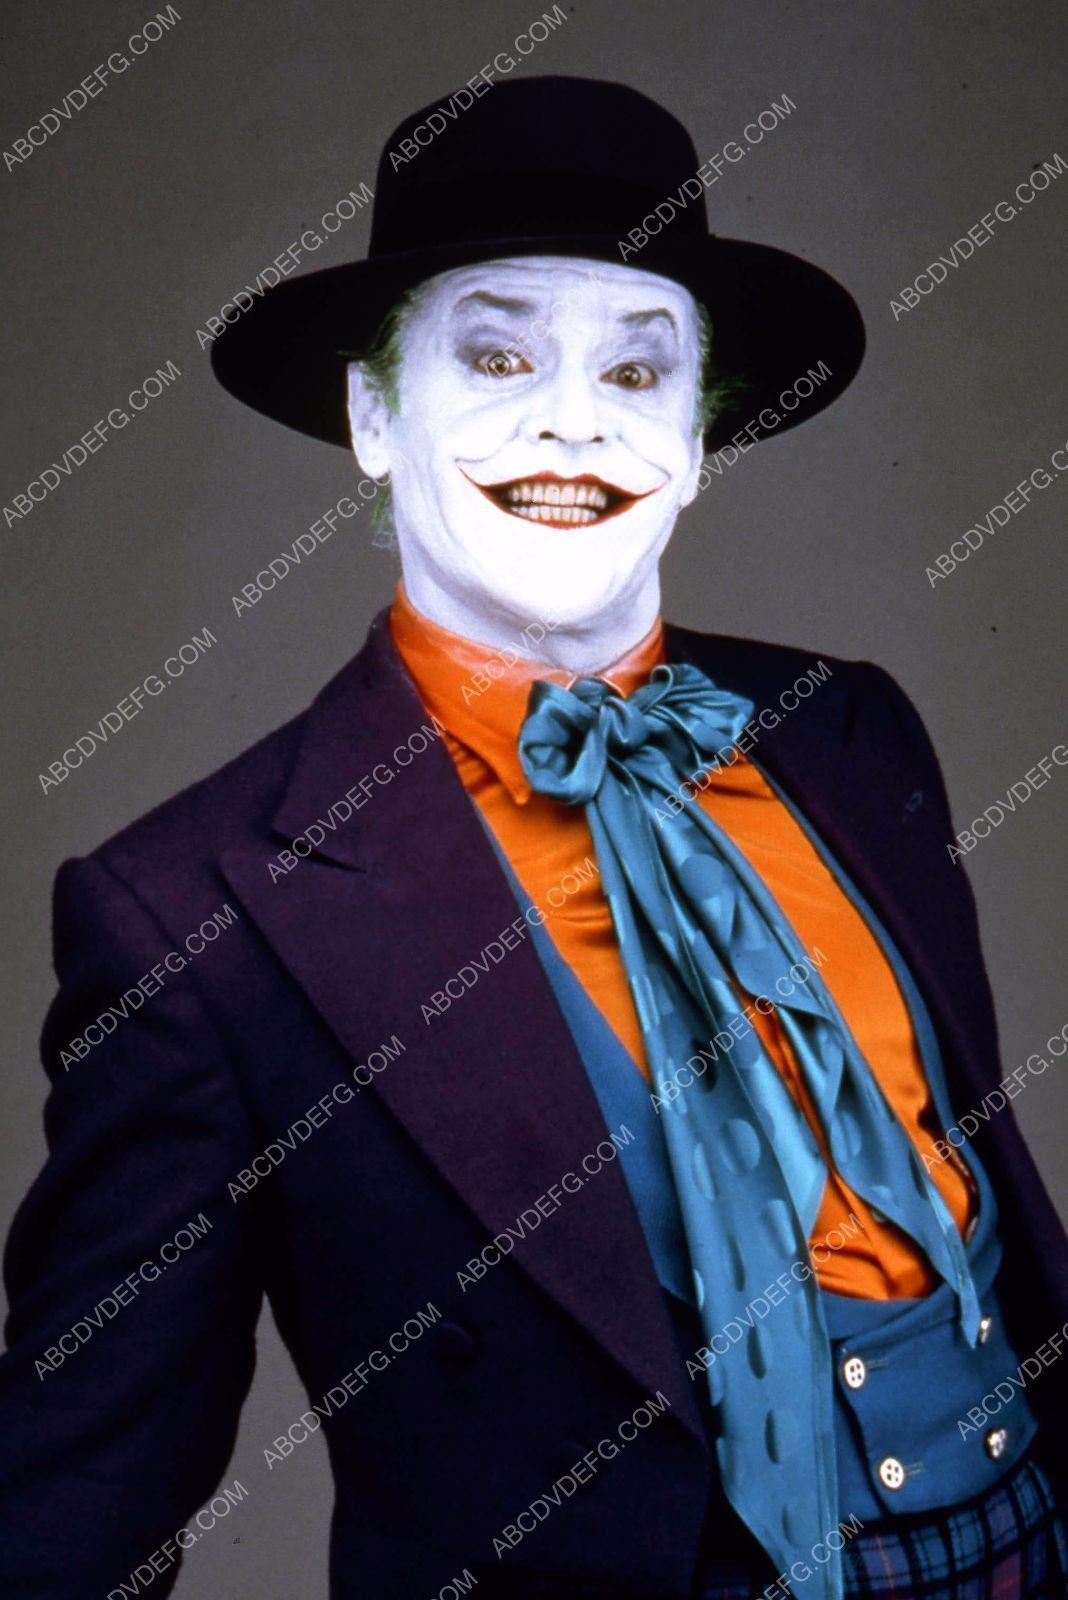 Jack Nicholson as The Joker film The Batman 35m1292